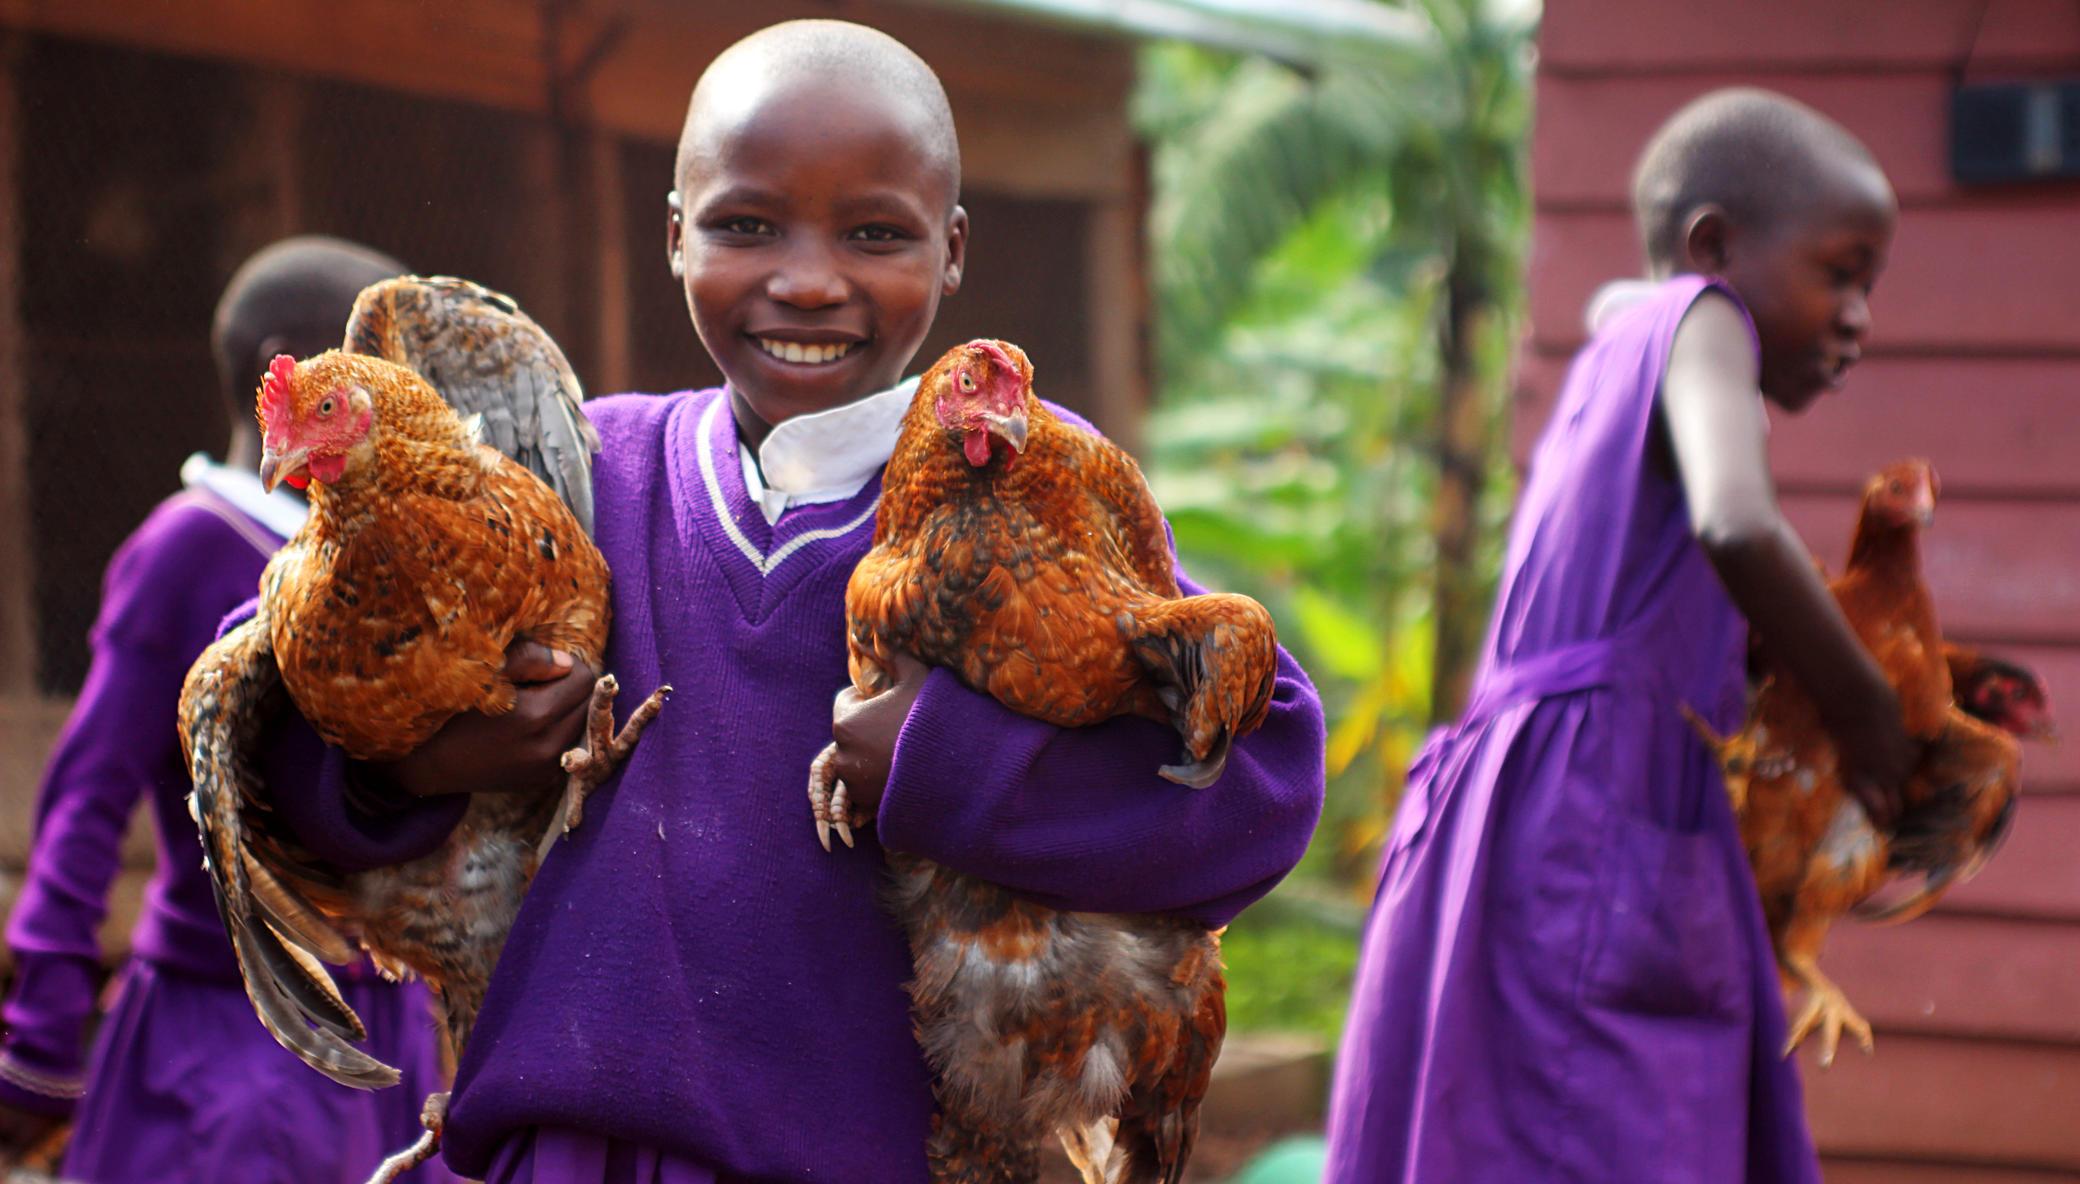 High quality education for children in Uganda